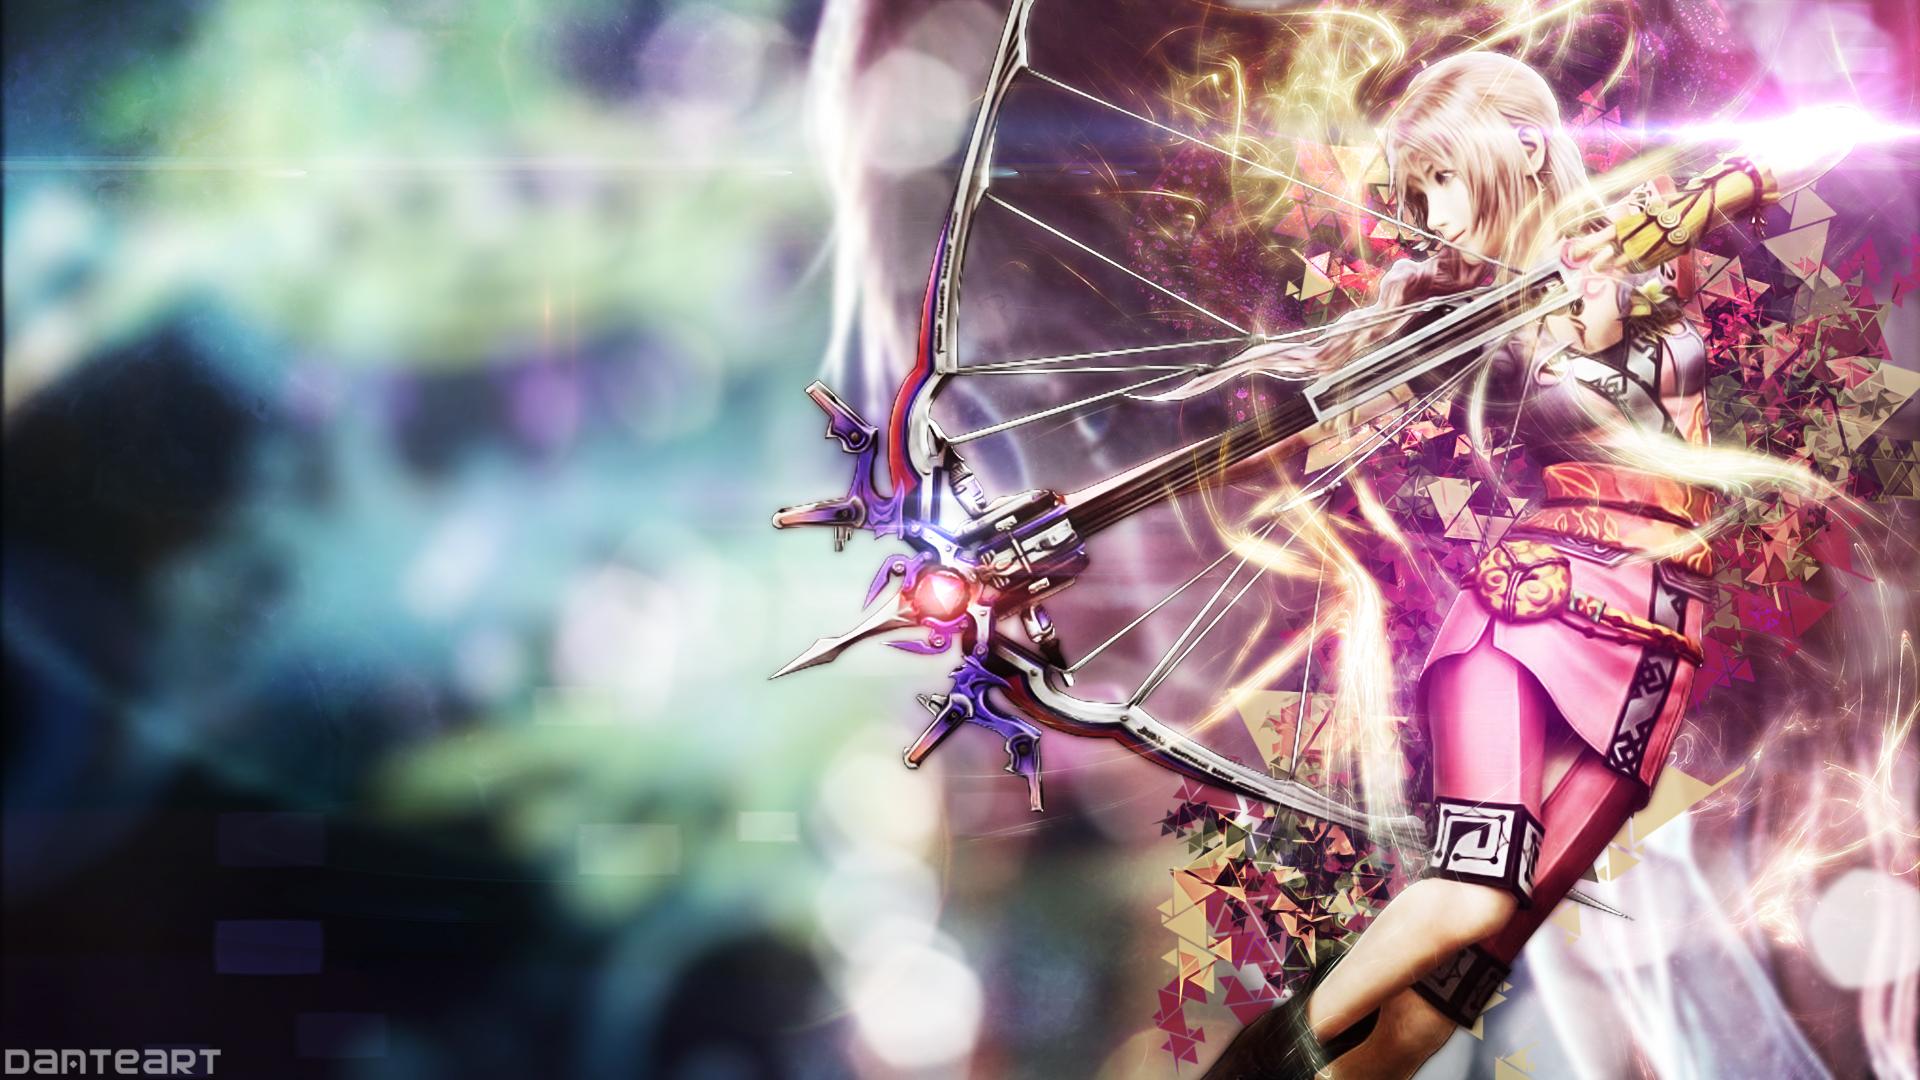 Final Fantasy 13 2 Wallpaper: Final Fantasy XIII 2 Serah Wallpaper By DanteArtWallpapers